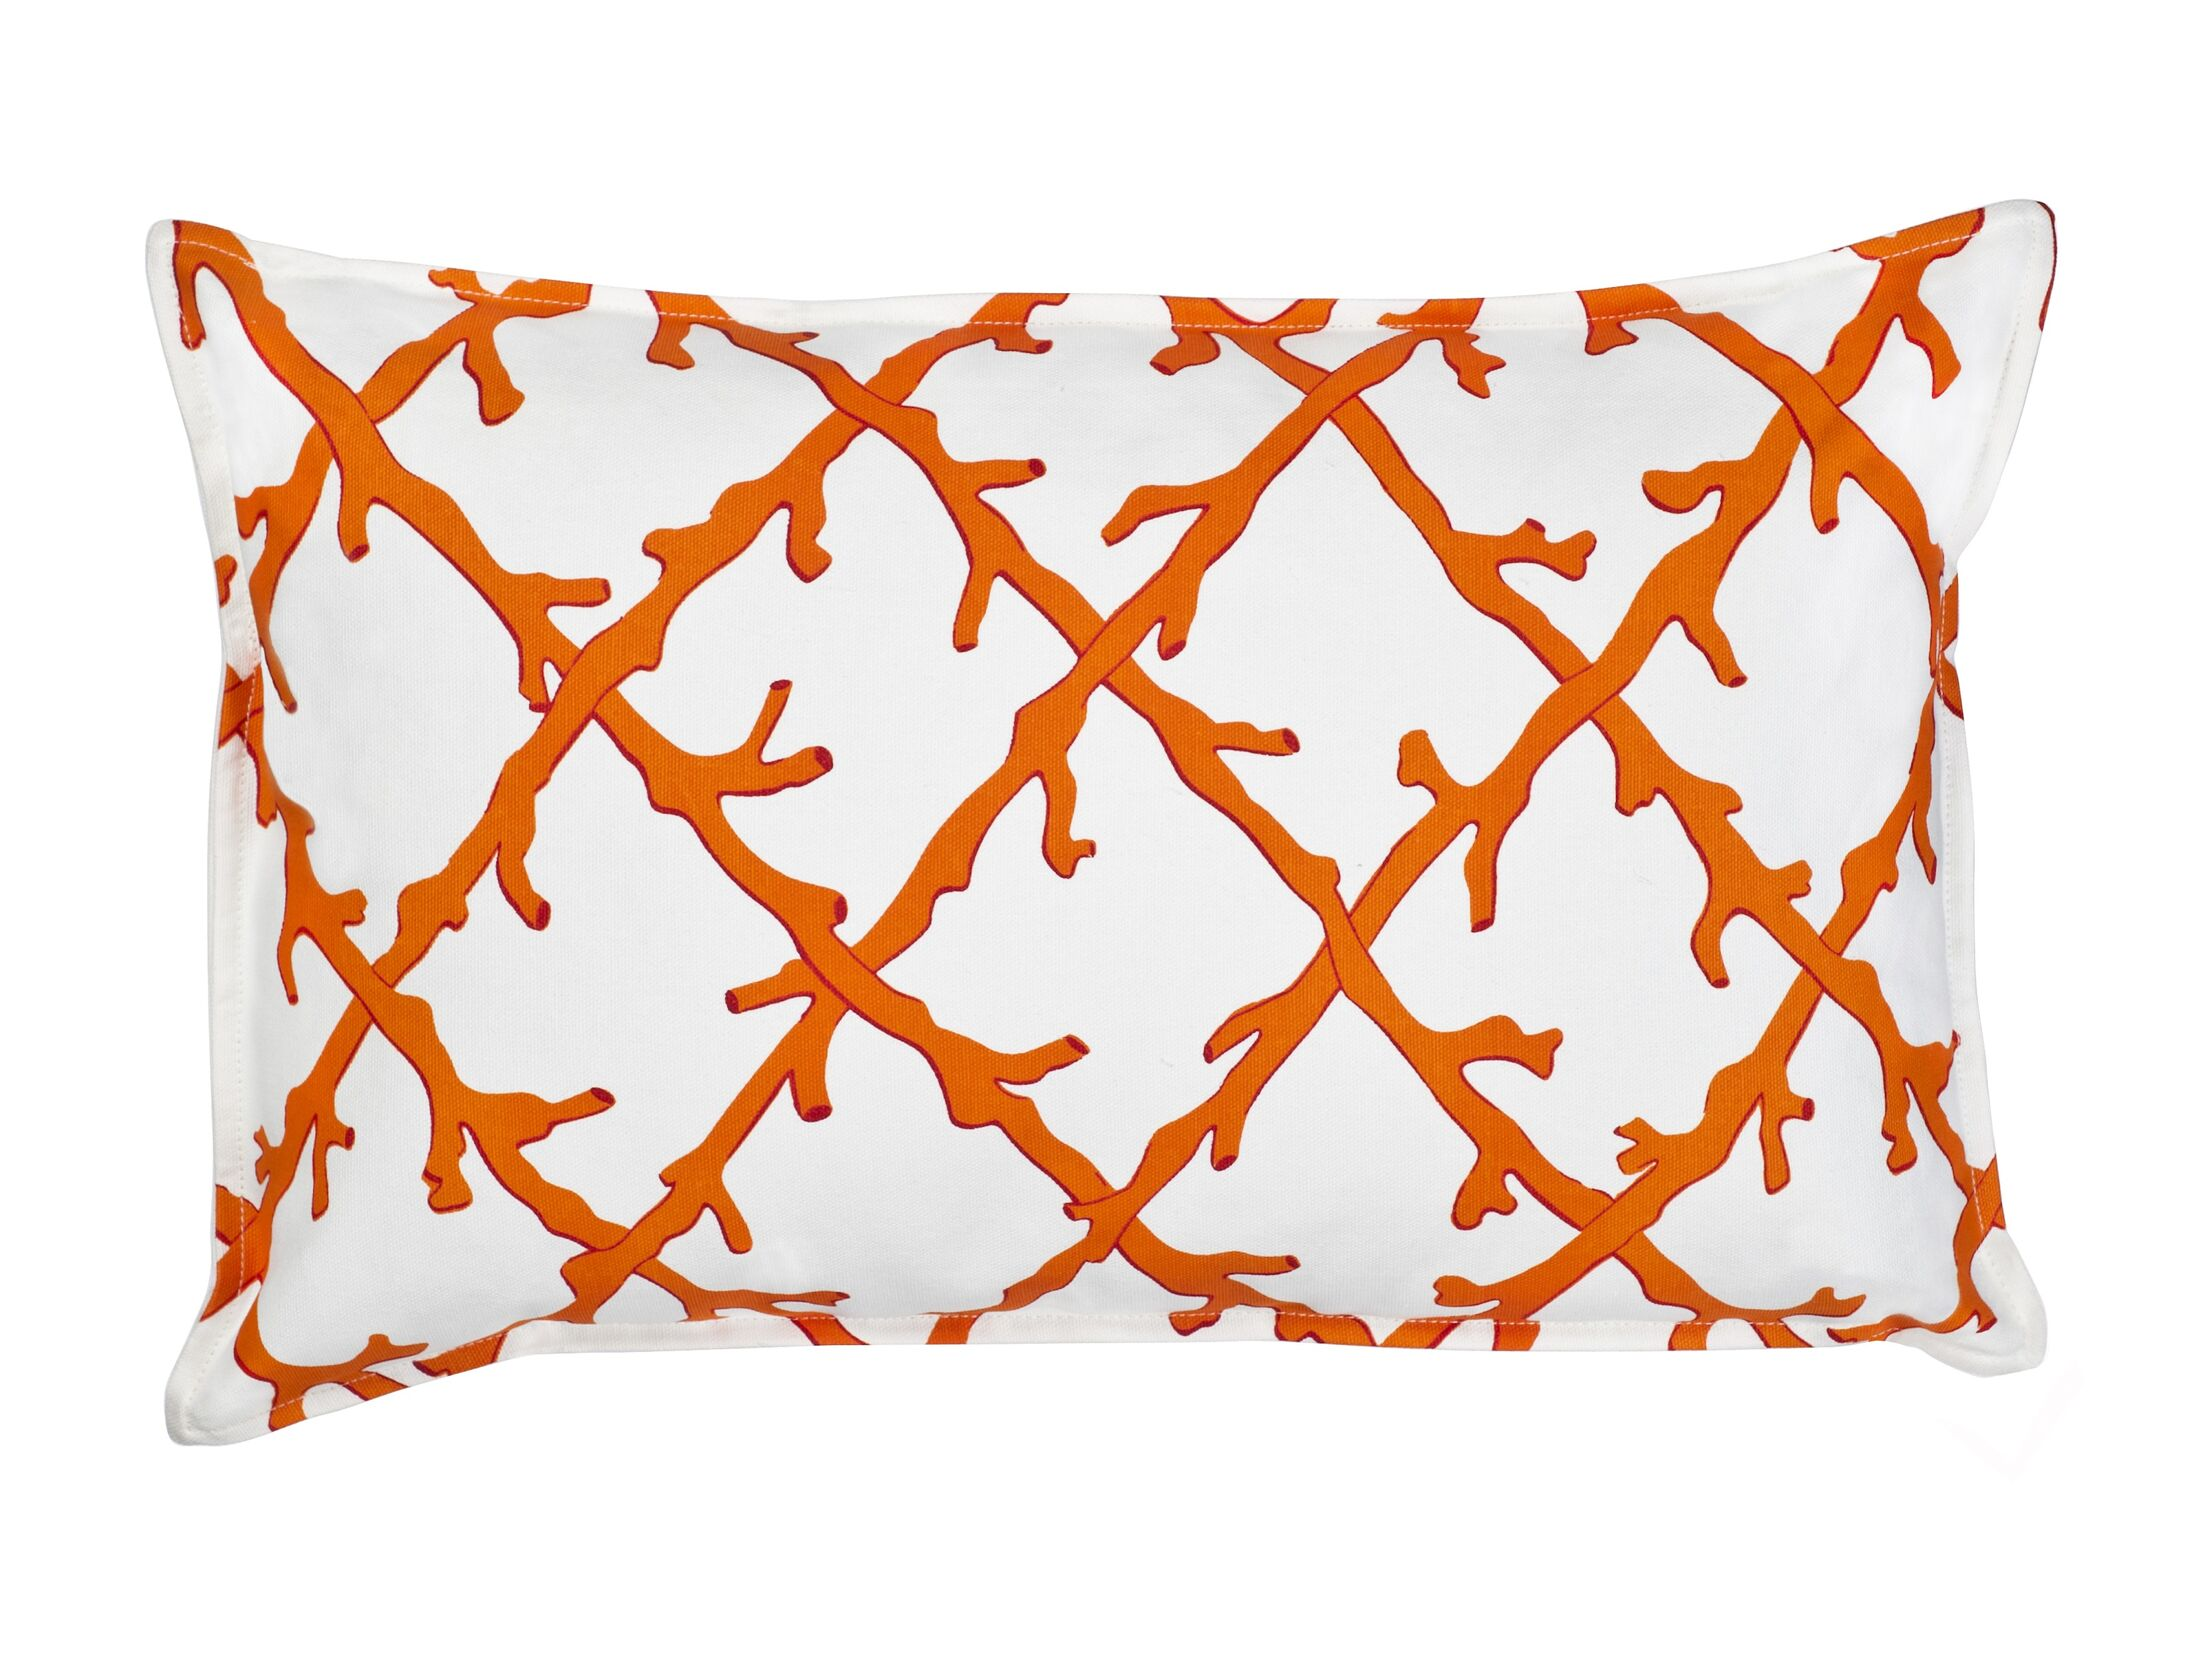 Lattice Cotton Canvas Lumbar Pillow Color: Orange